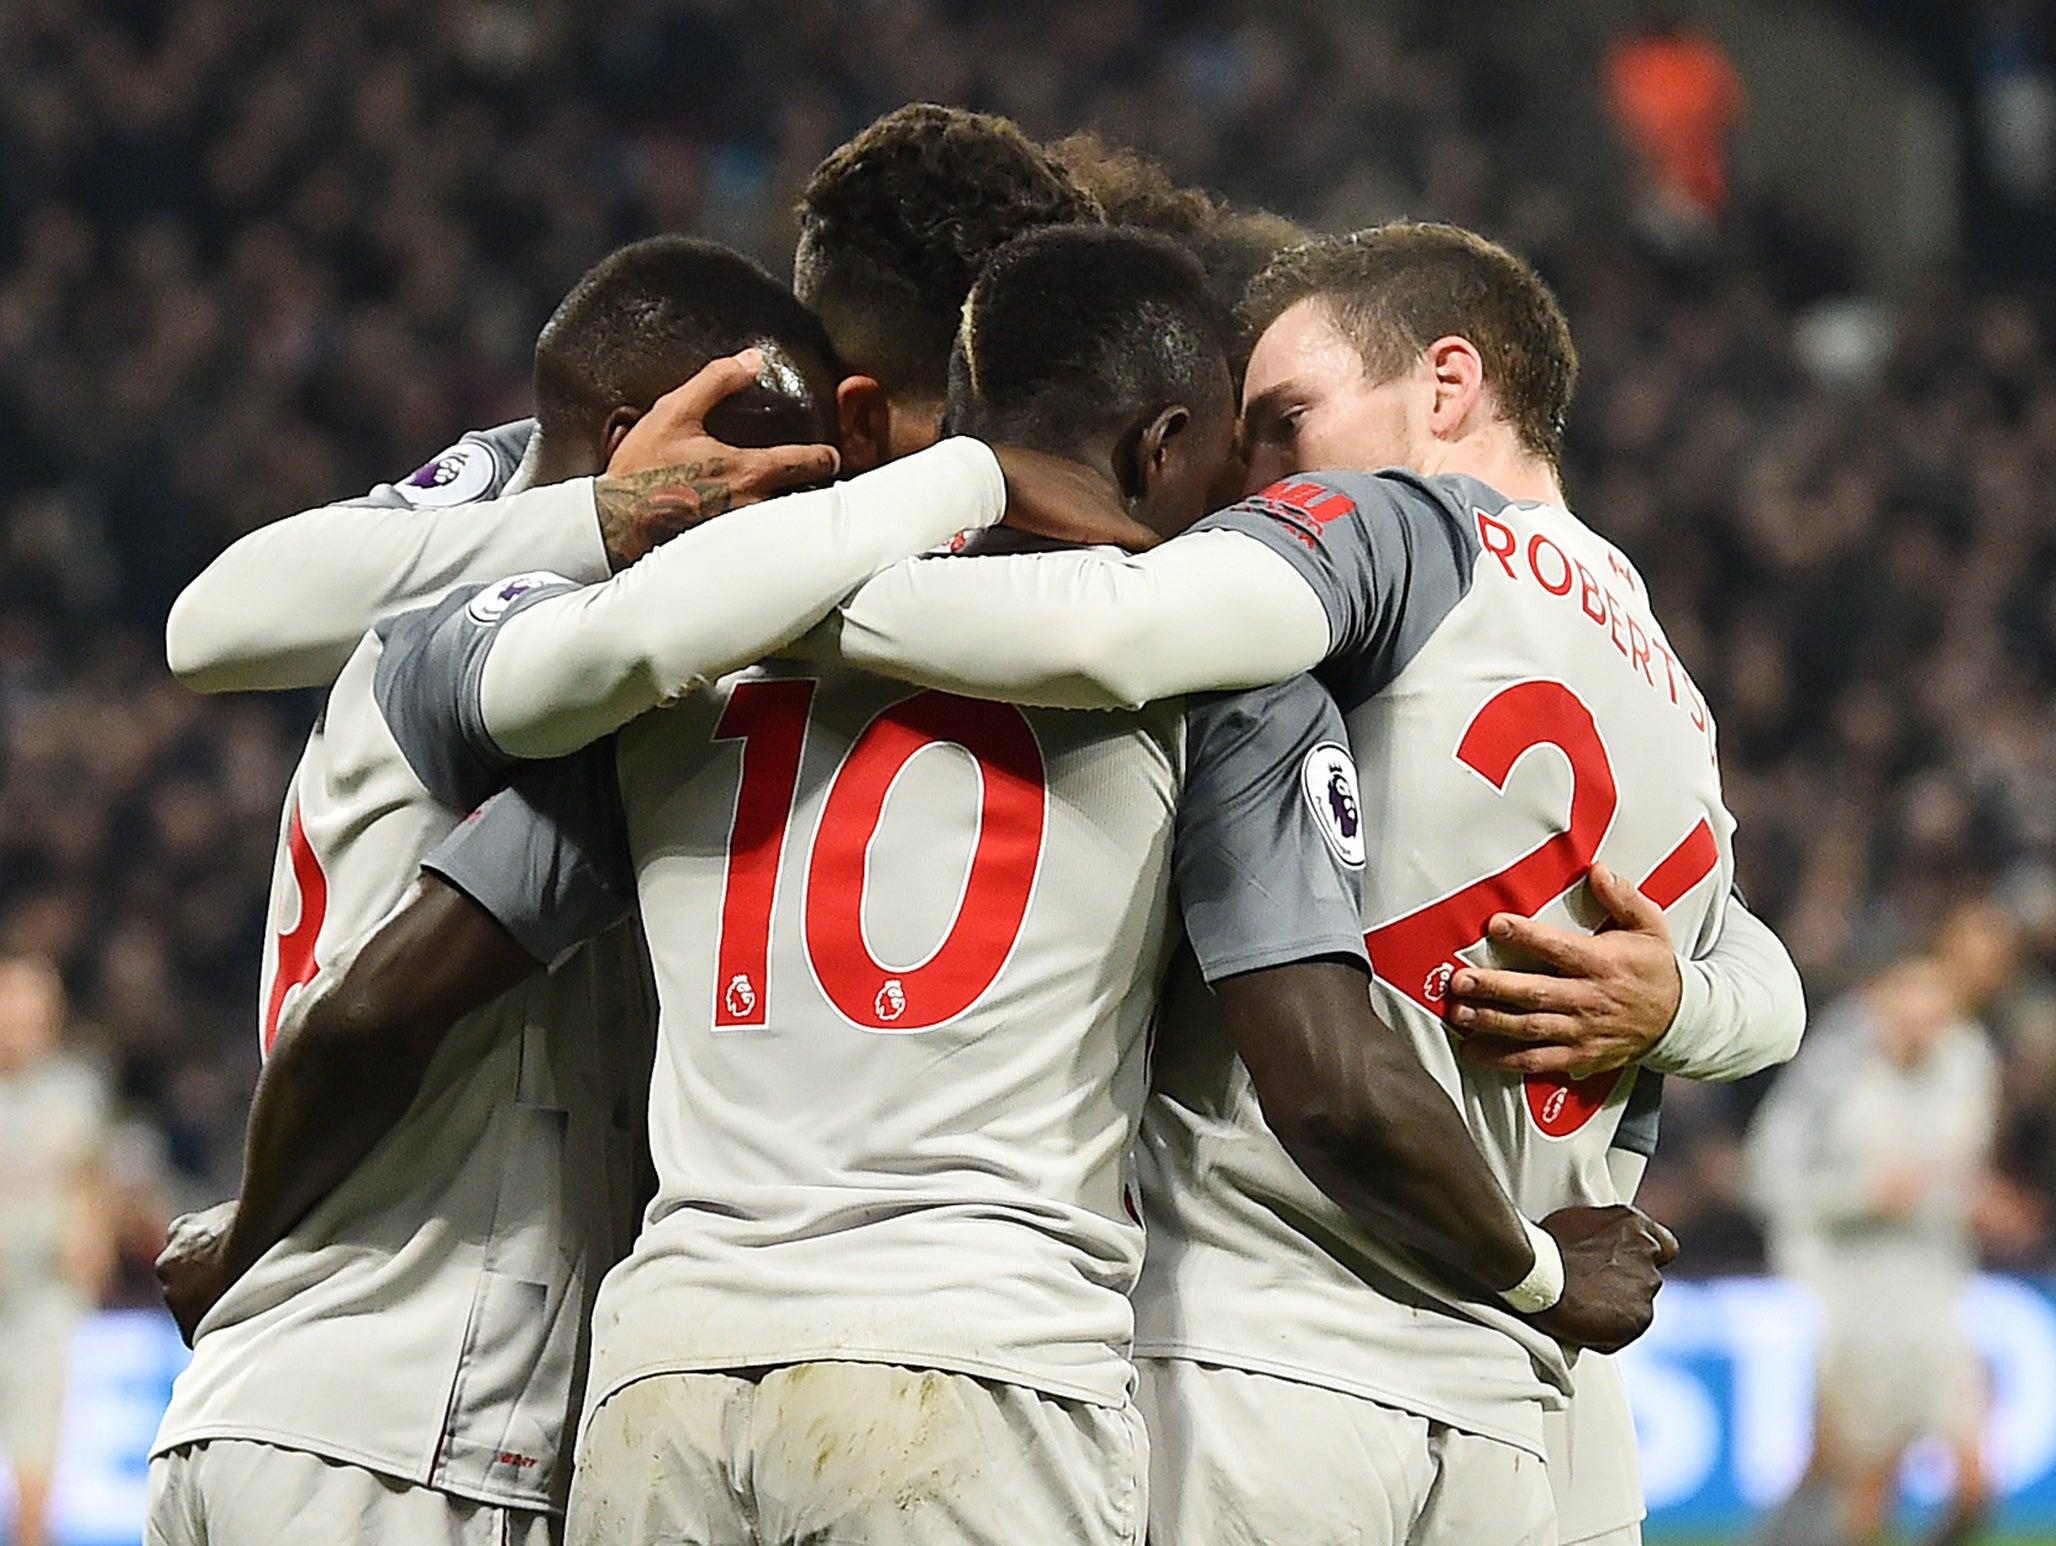 West Ham vs Liverpool player ratings: Sadio Mane and Michail Antonio score but Naby Keita struggles